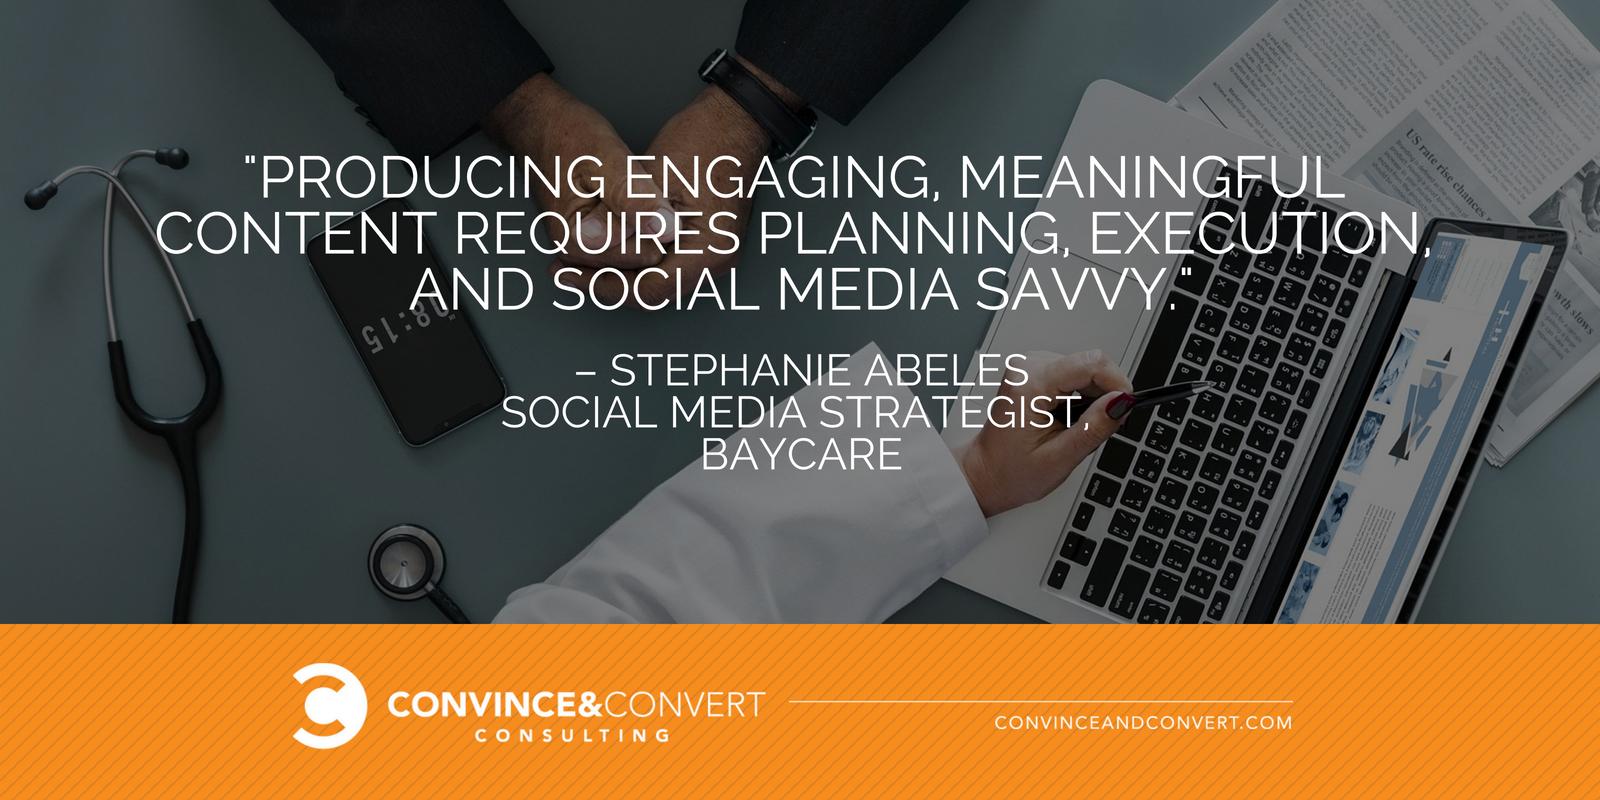 19 Outstanding Hospital Social Media Teams | Convince & Convert